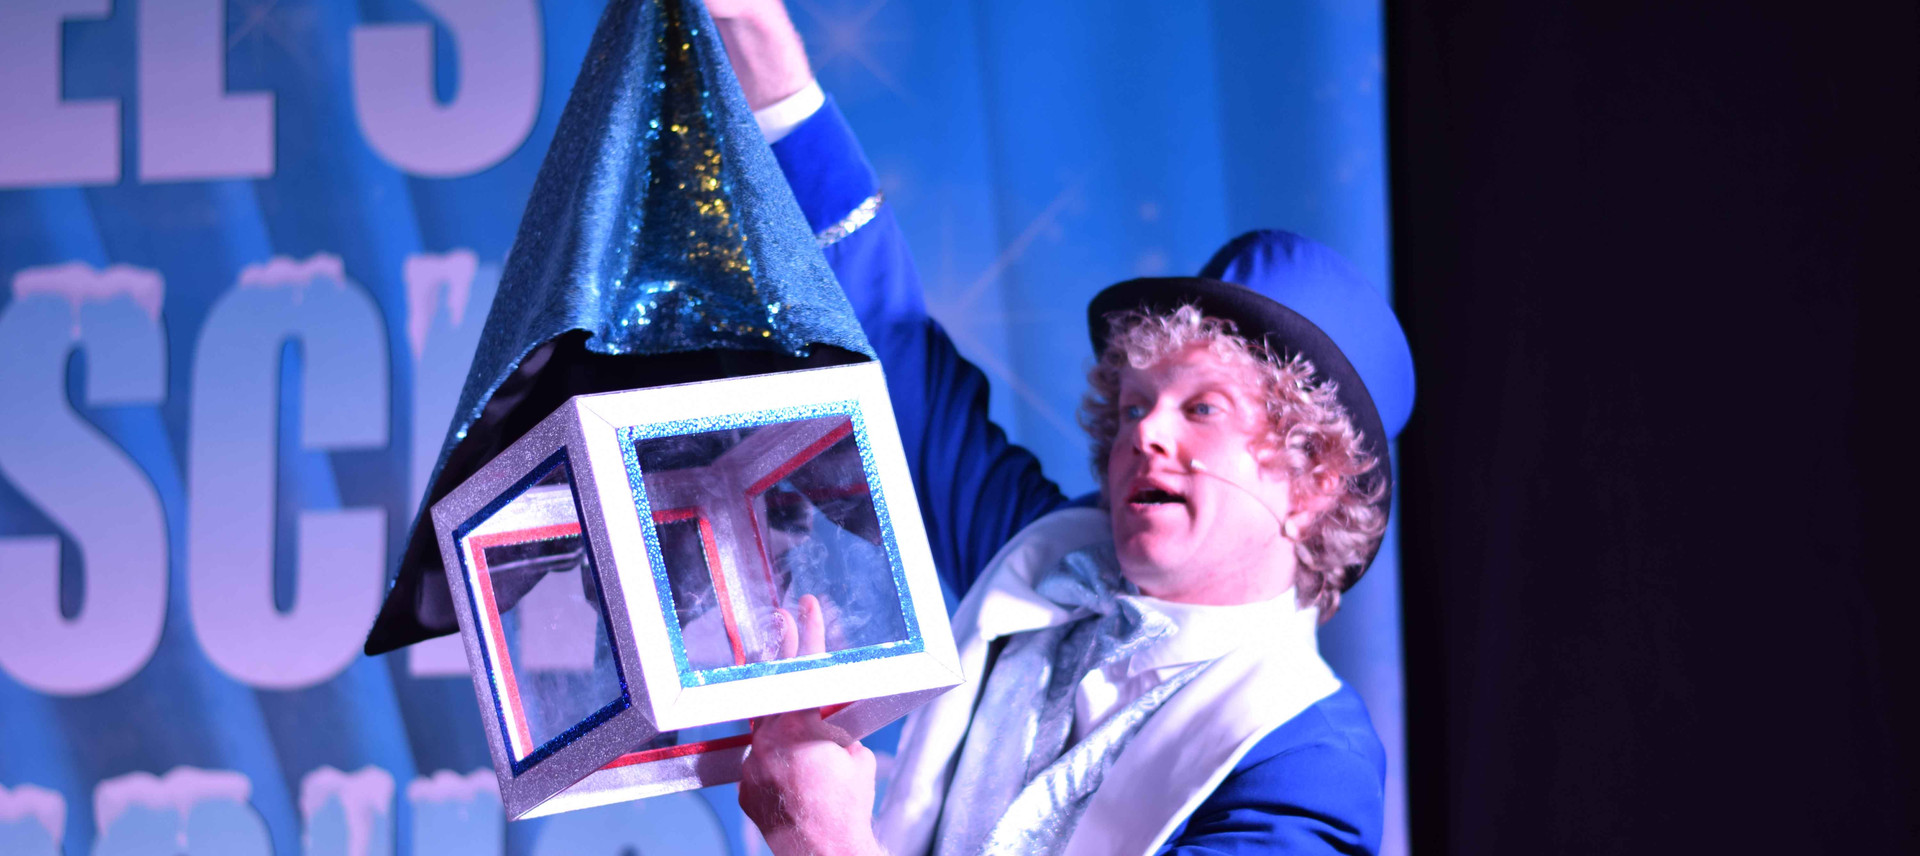 showman kinderfeest goochelaar goochelfe